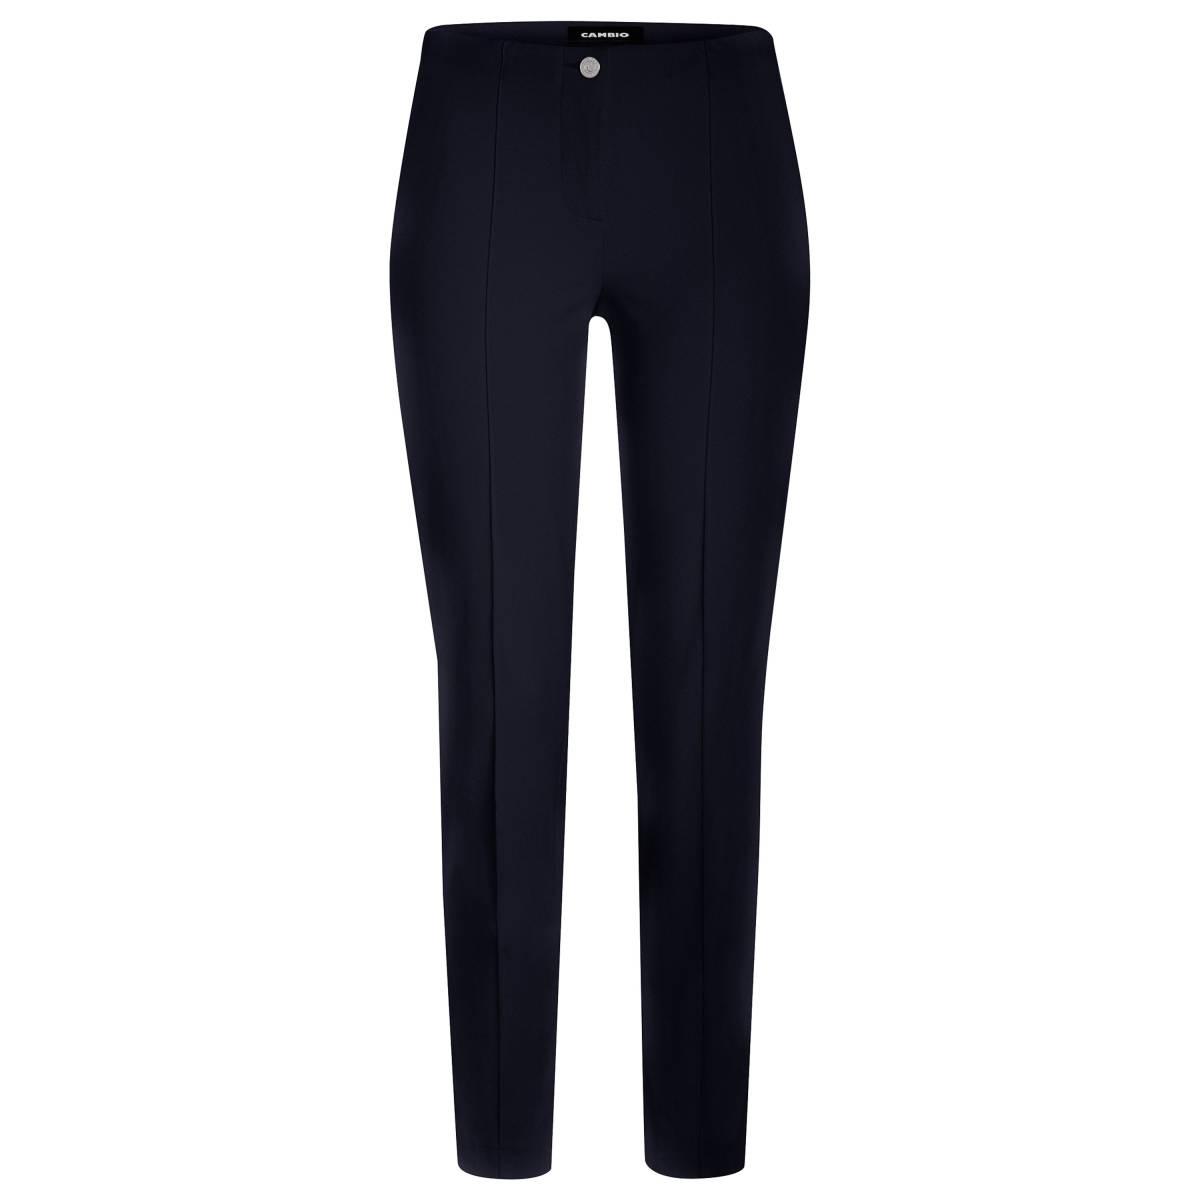 CAMBIO pantalon ros L29-7